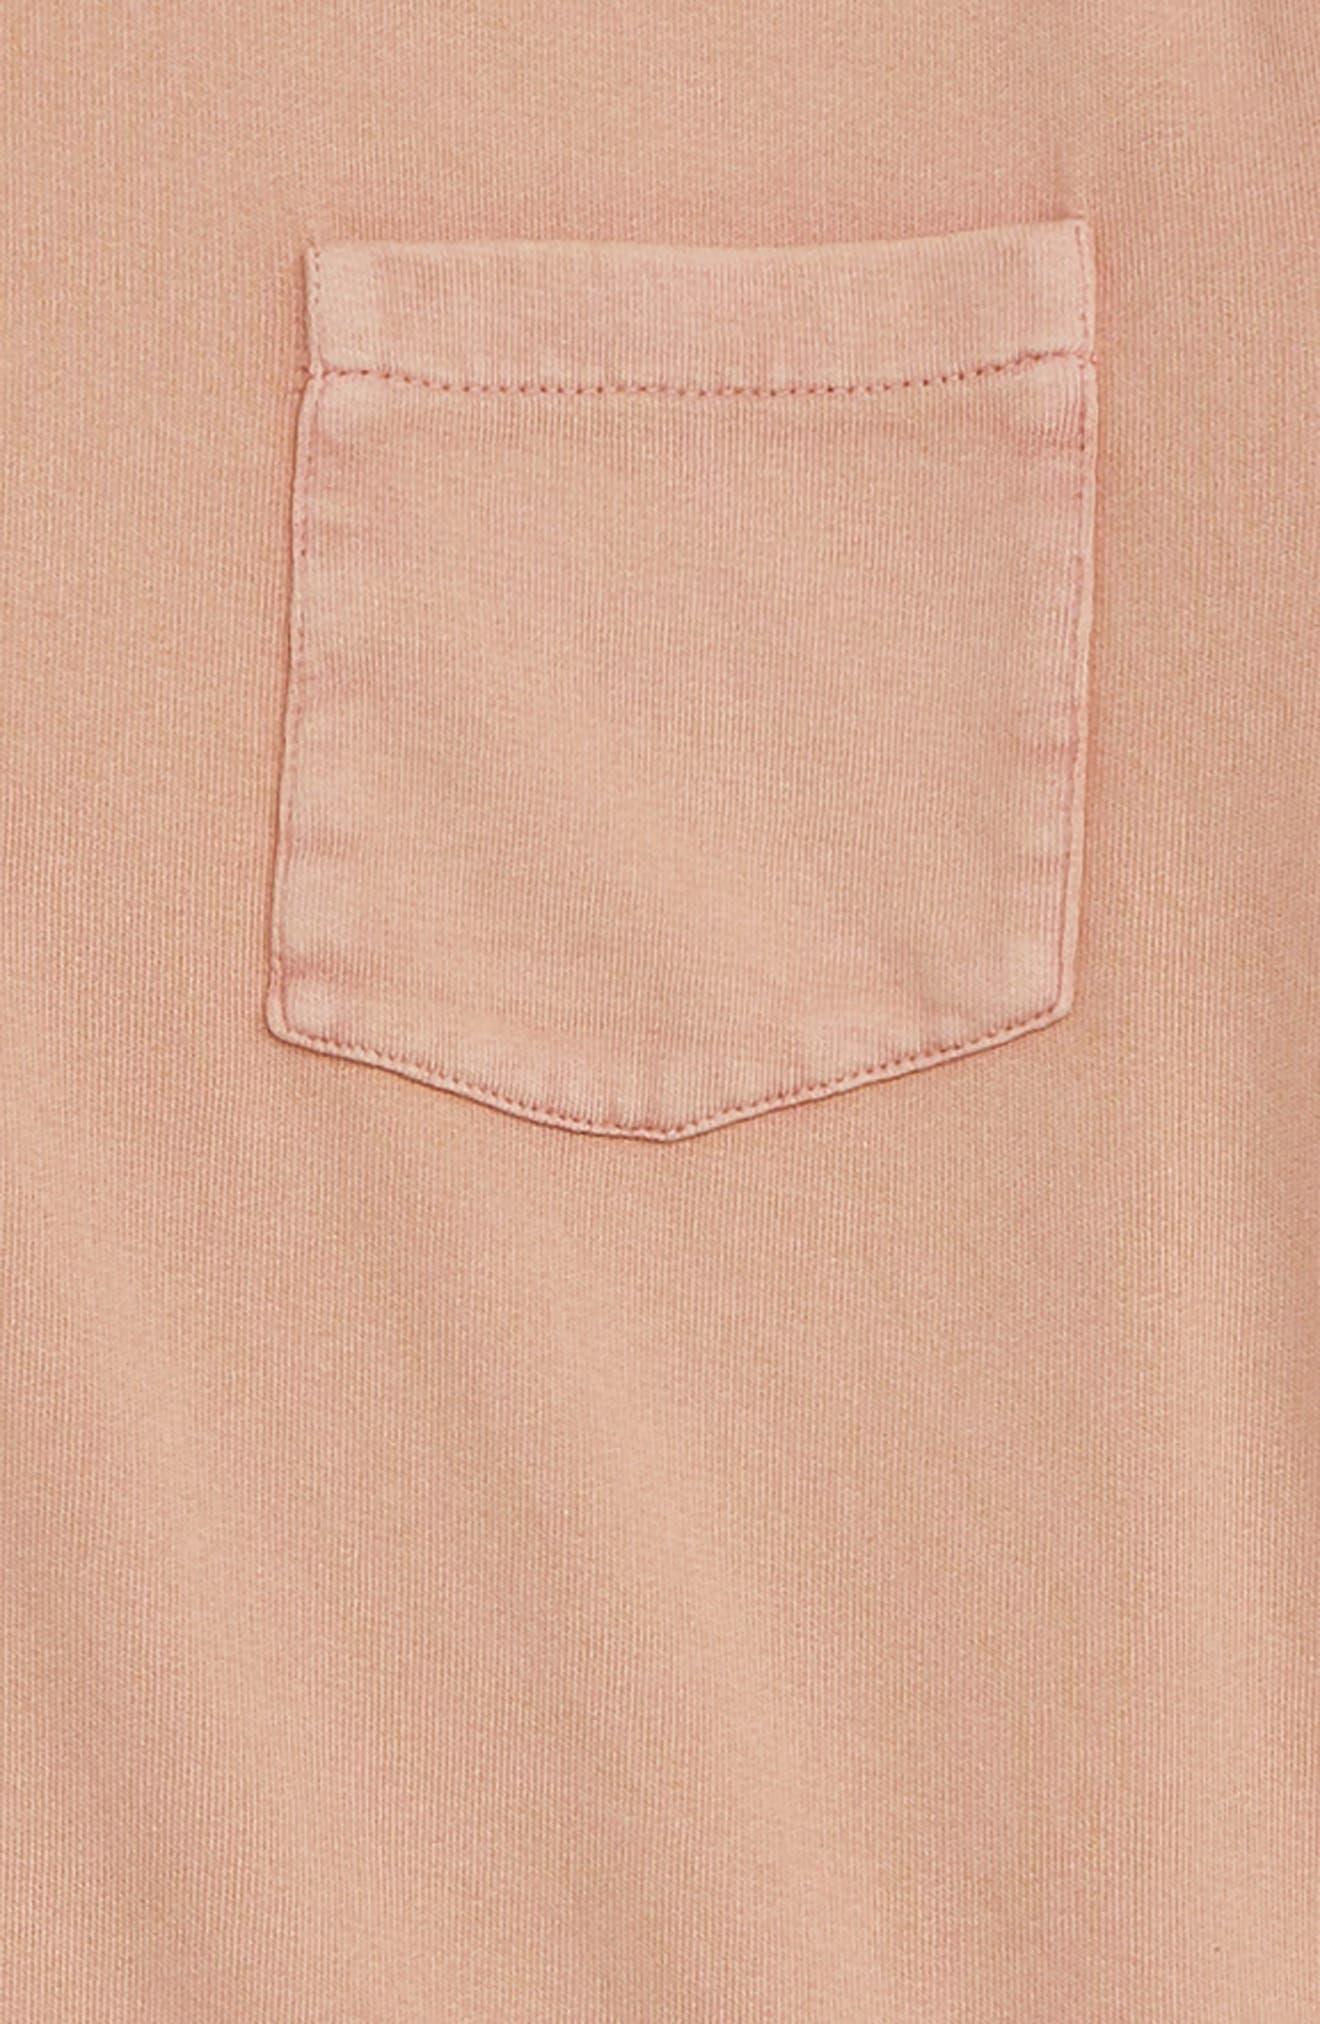 Pocket Top,                             Alternate thumbnail 2, color,                             680